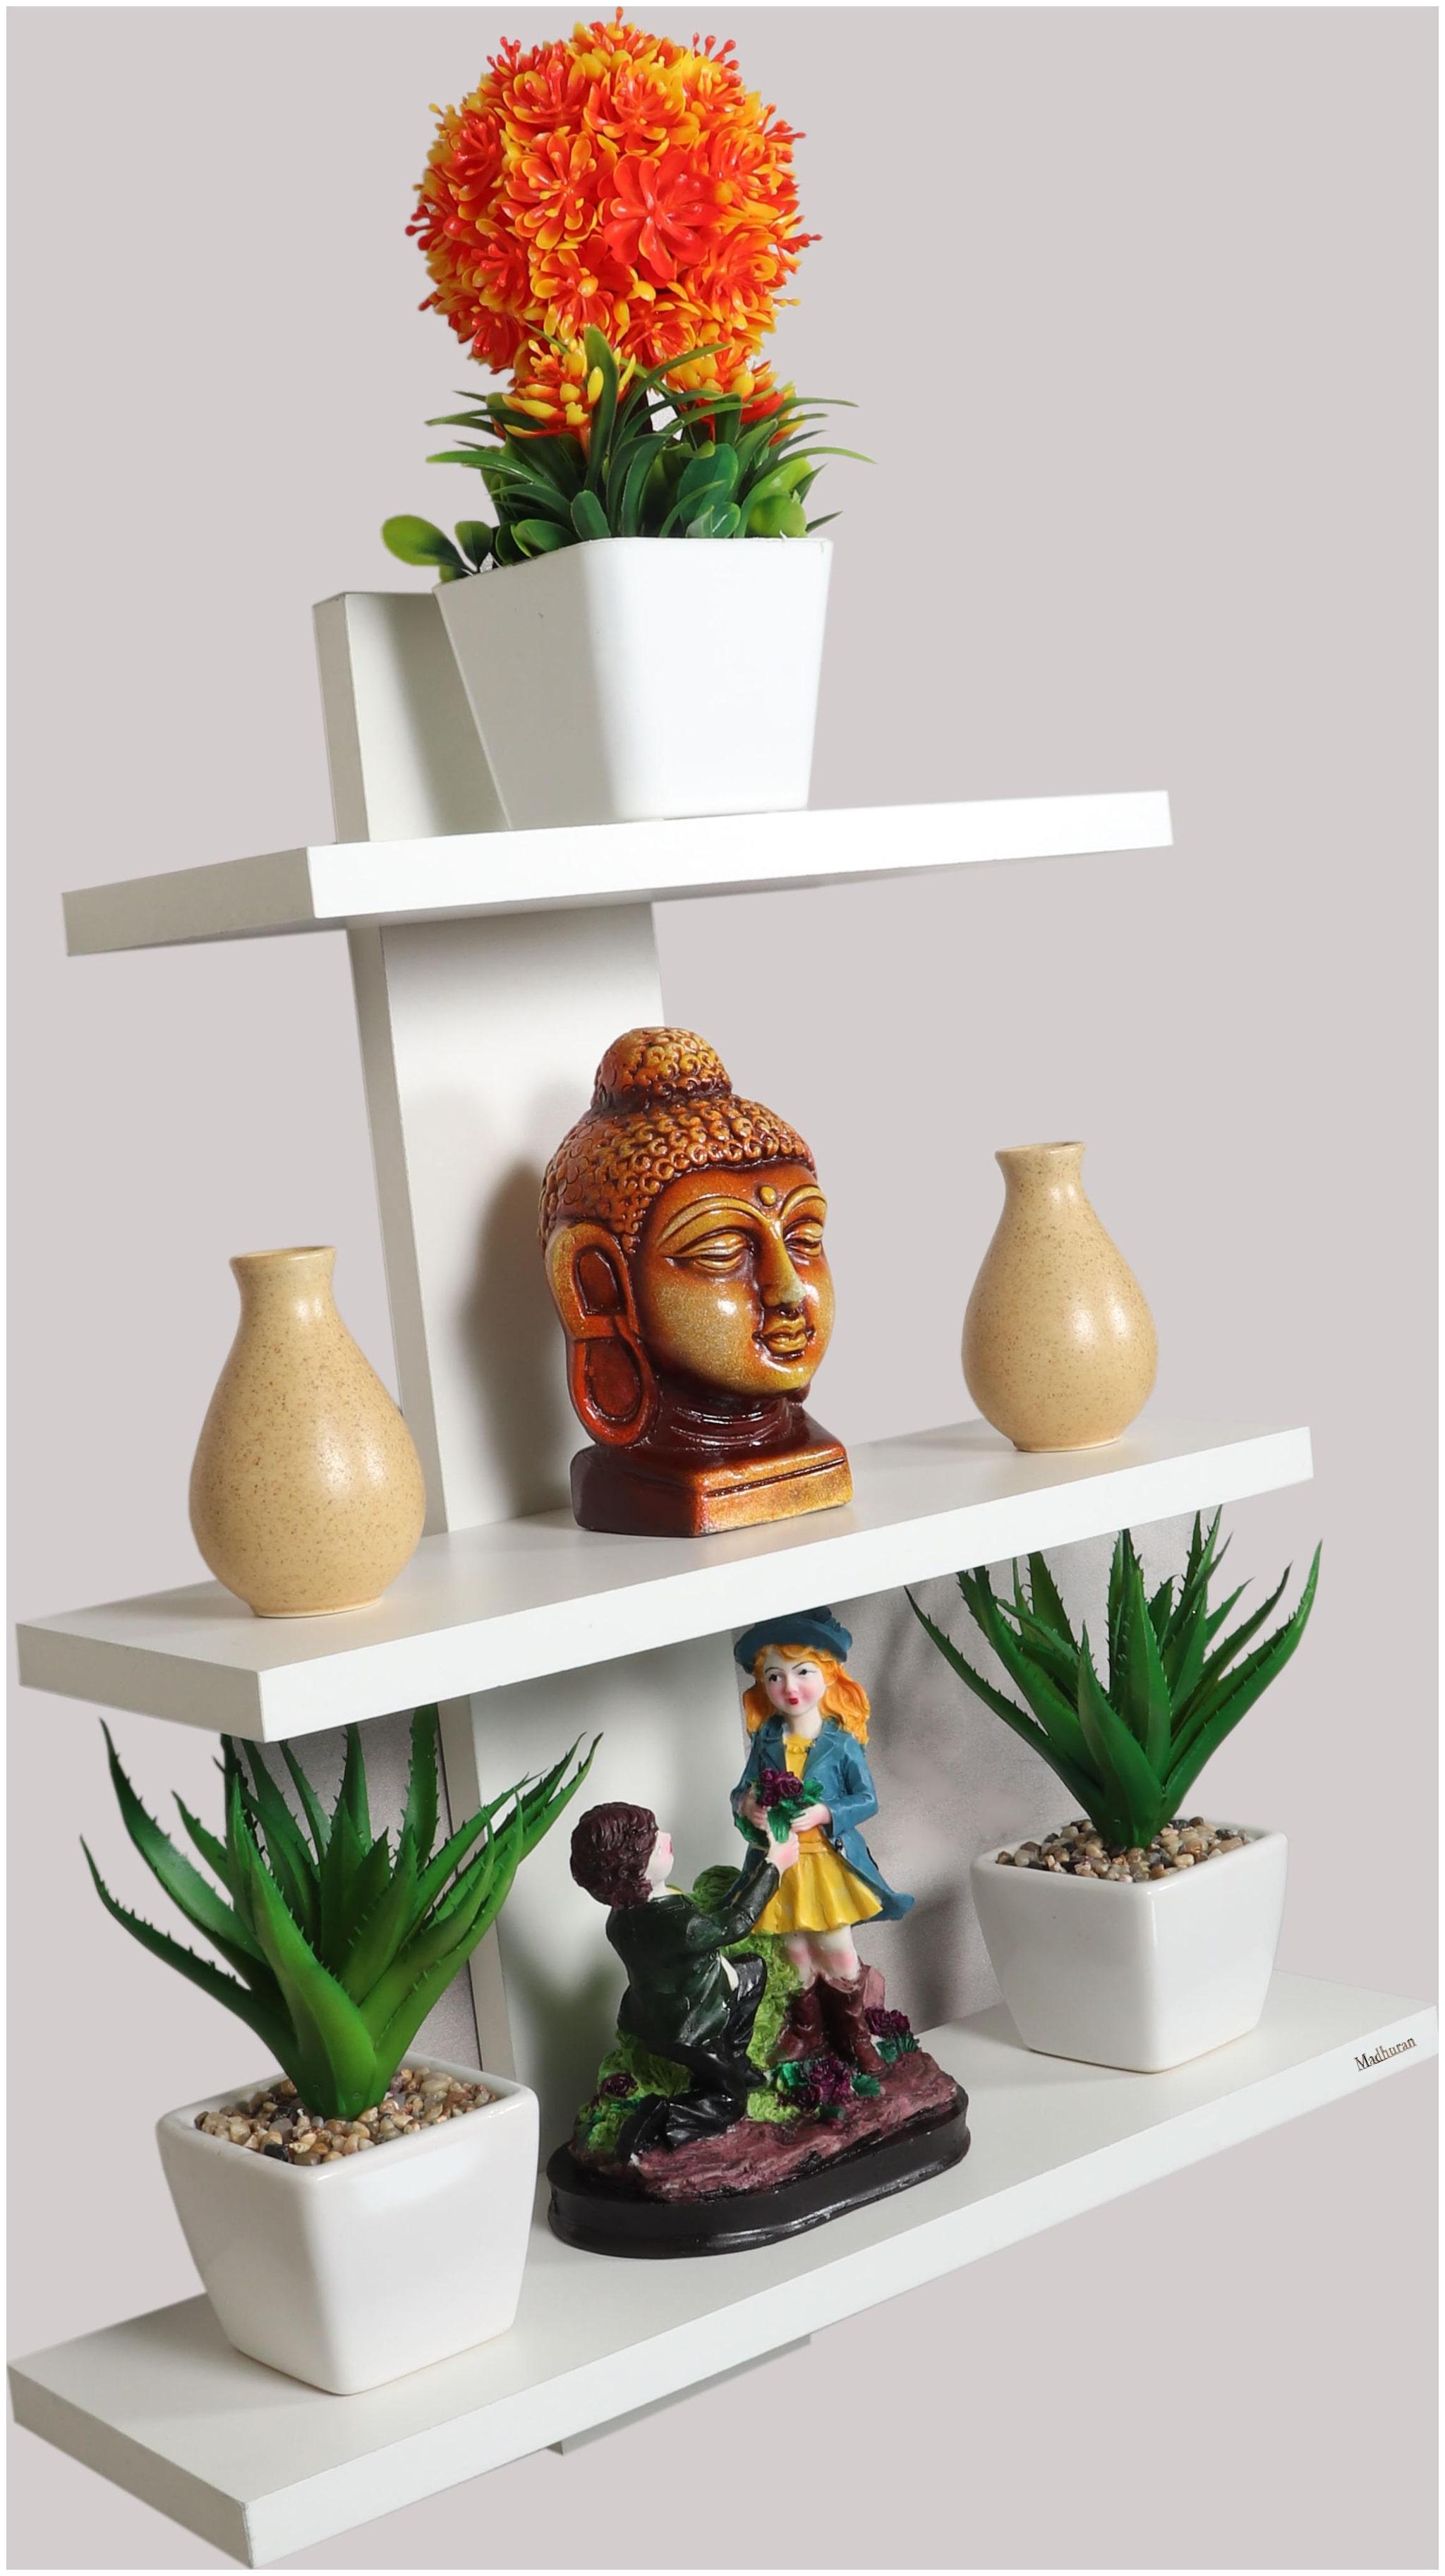 Madhuran  Batten Decorative Wall shelf set of 3 White / Wooden Decorative Decoration Dining Dark Storage Shelves Stand Slabs